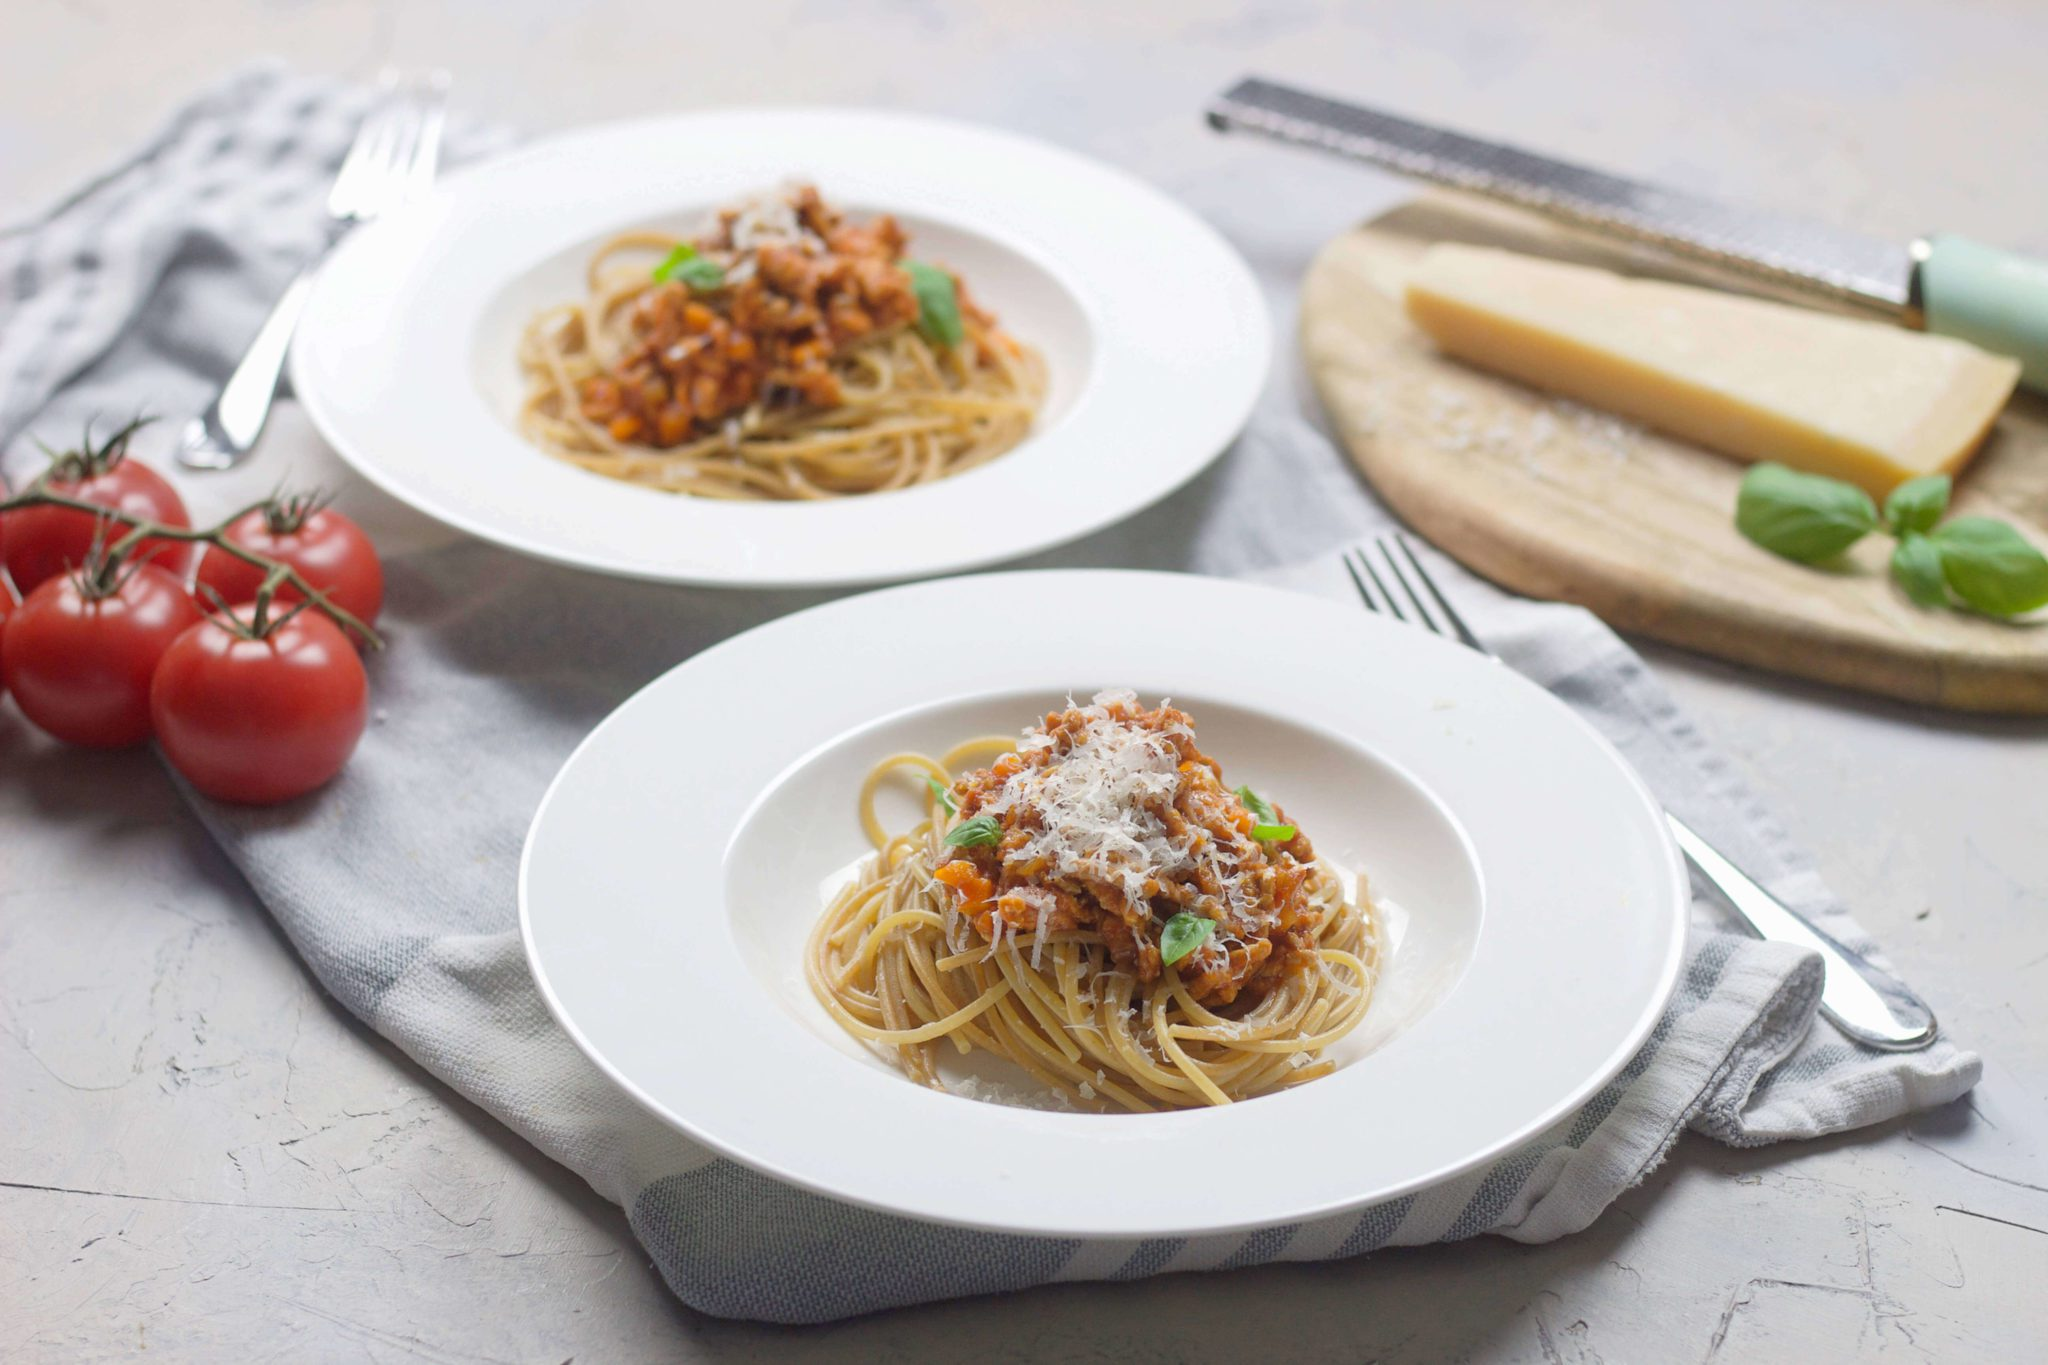 Homemade Bolognese sauce (alcohol-free)